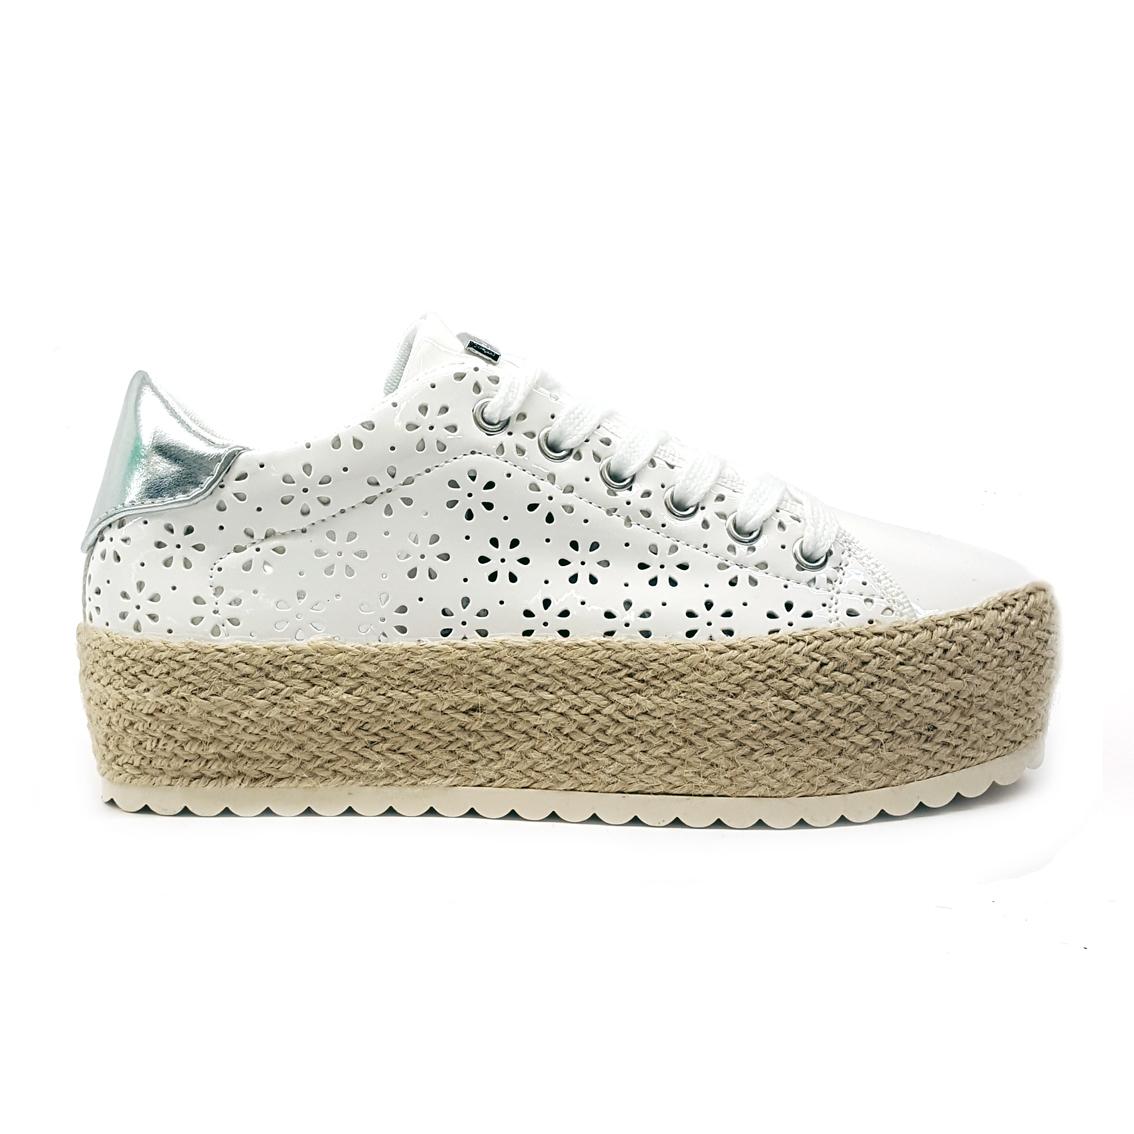 Sneaker bianca con zappa corda Guess